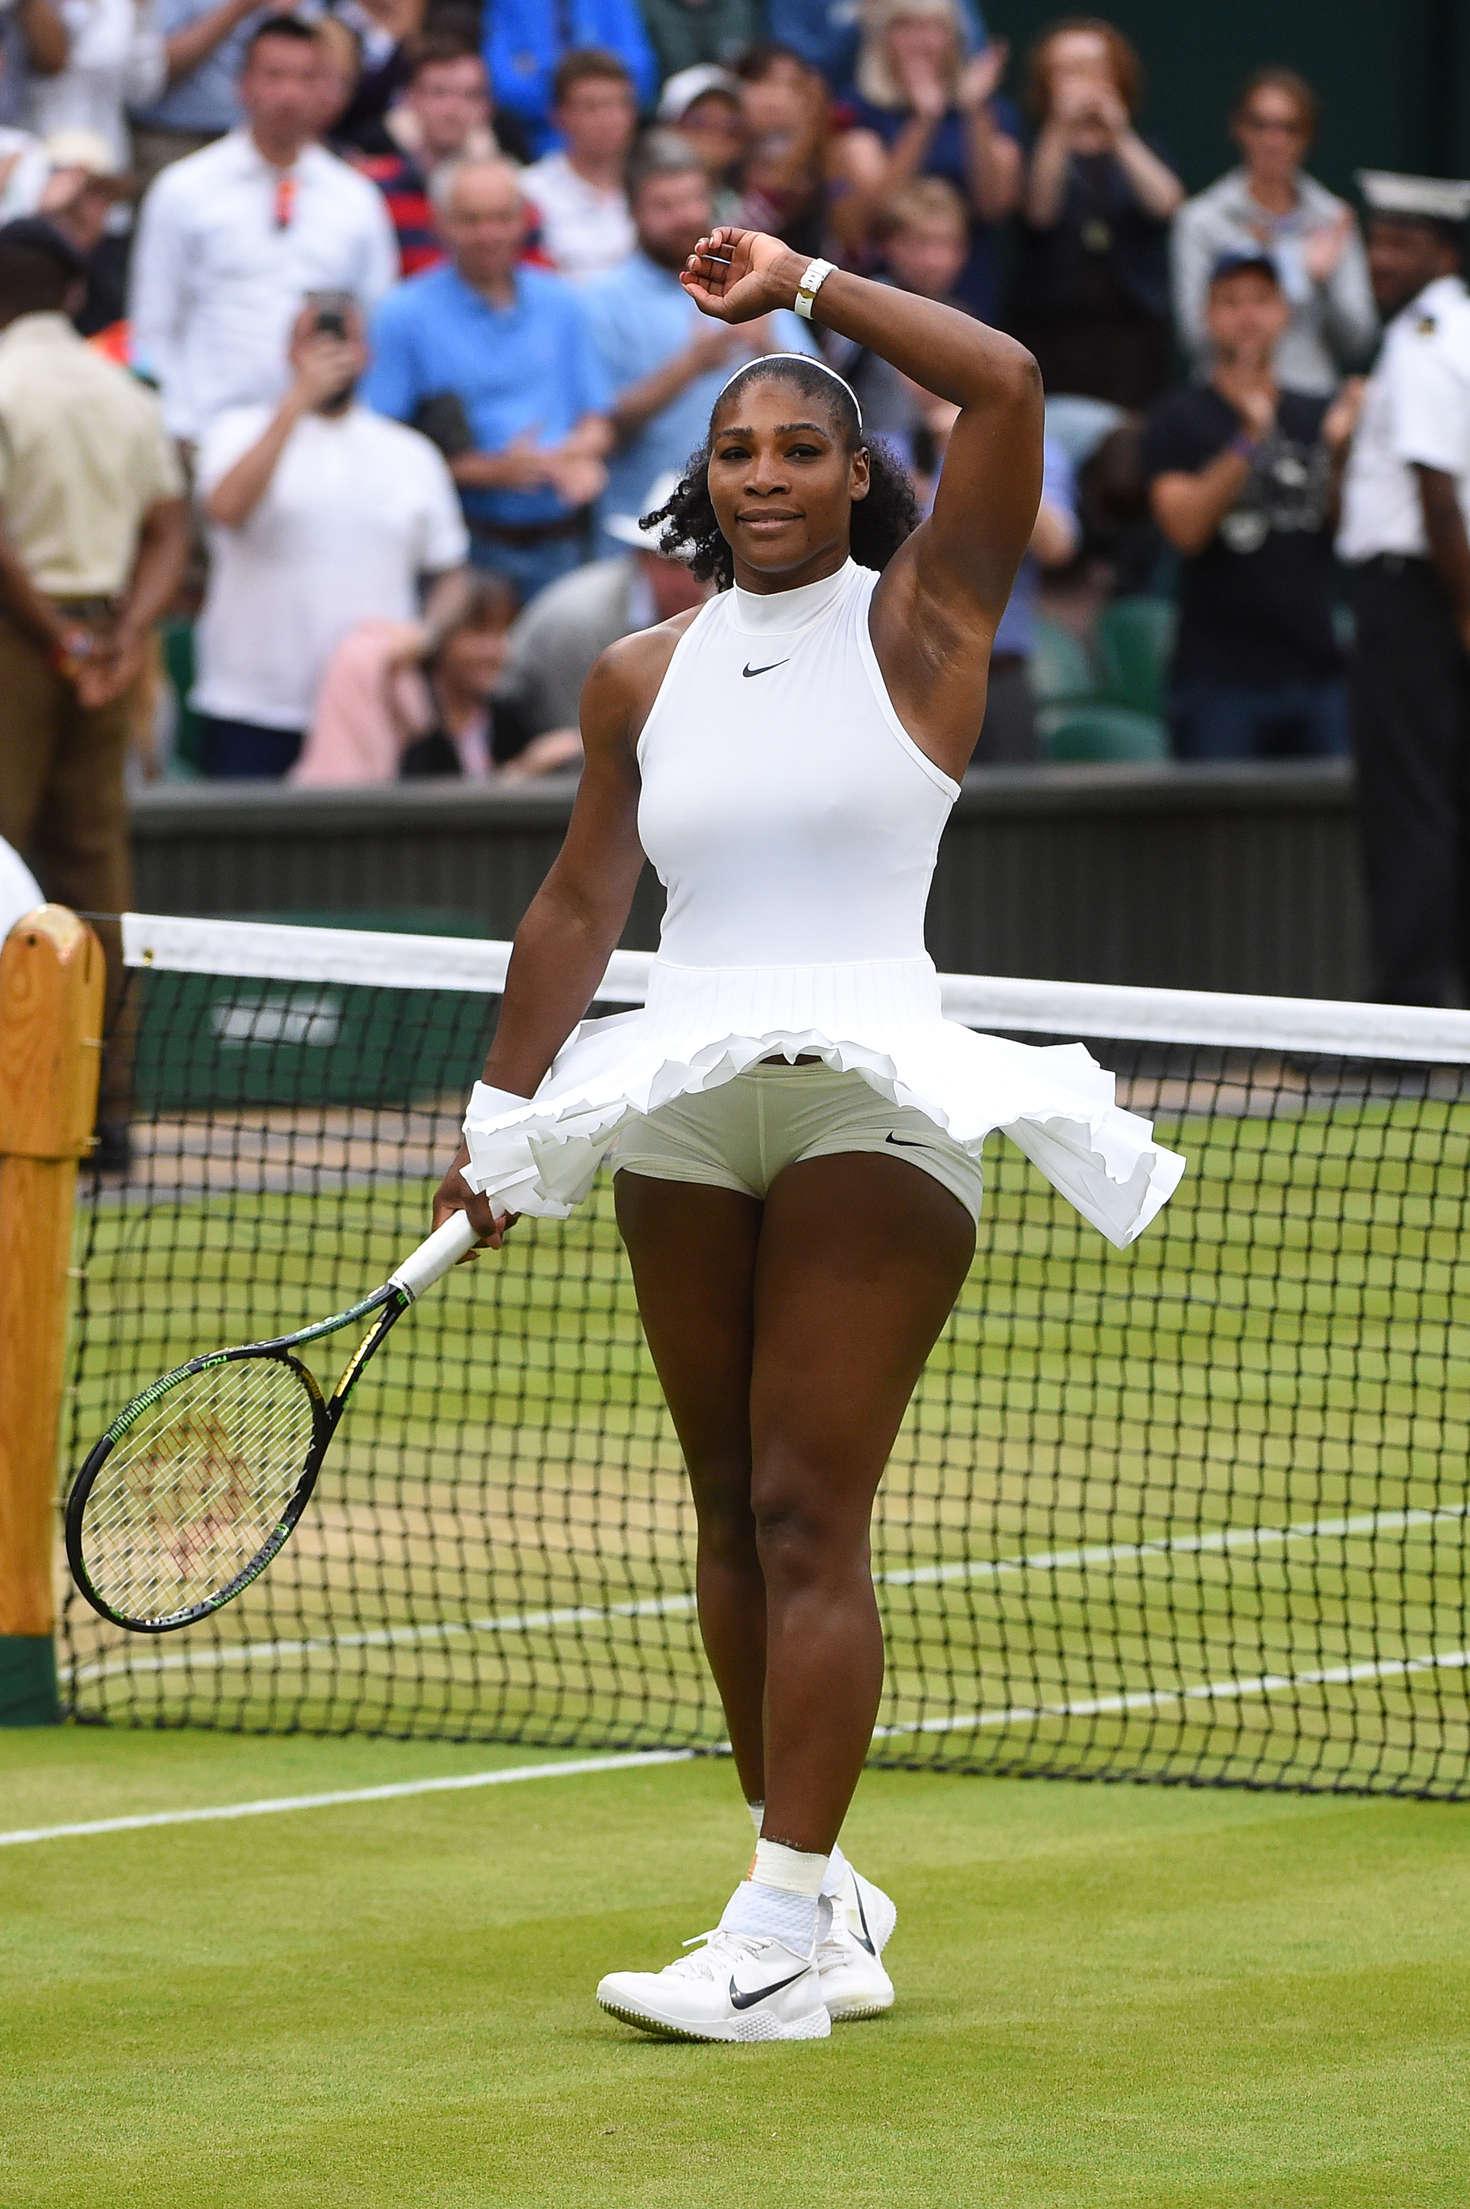 Serena Williams - 4th Round Match 2016 in Wimbledon Lindsay Lohan Net Worth